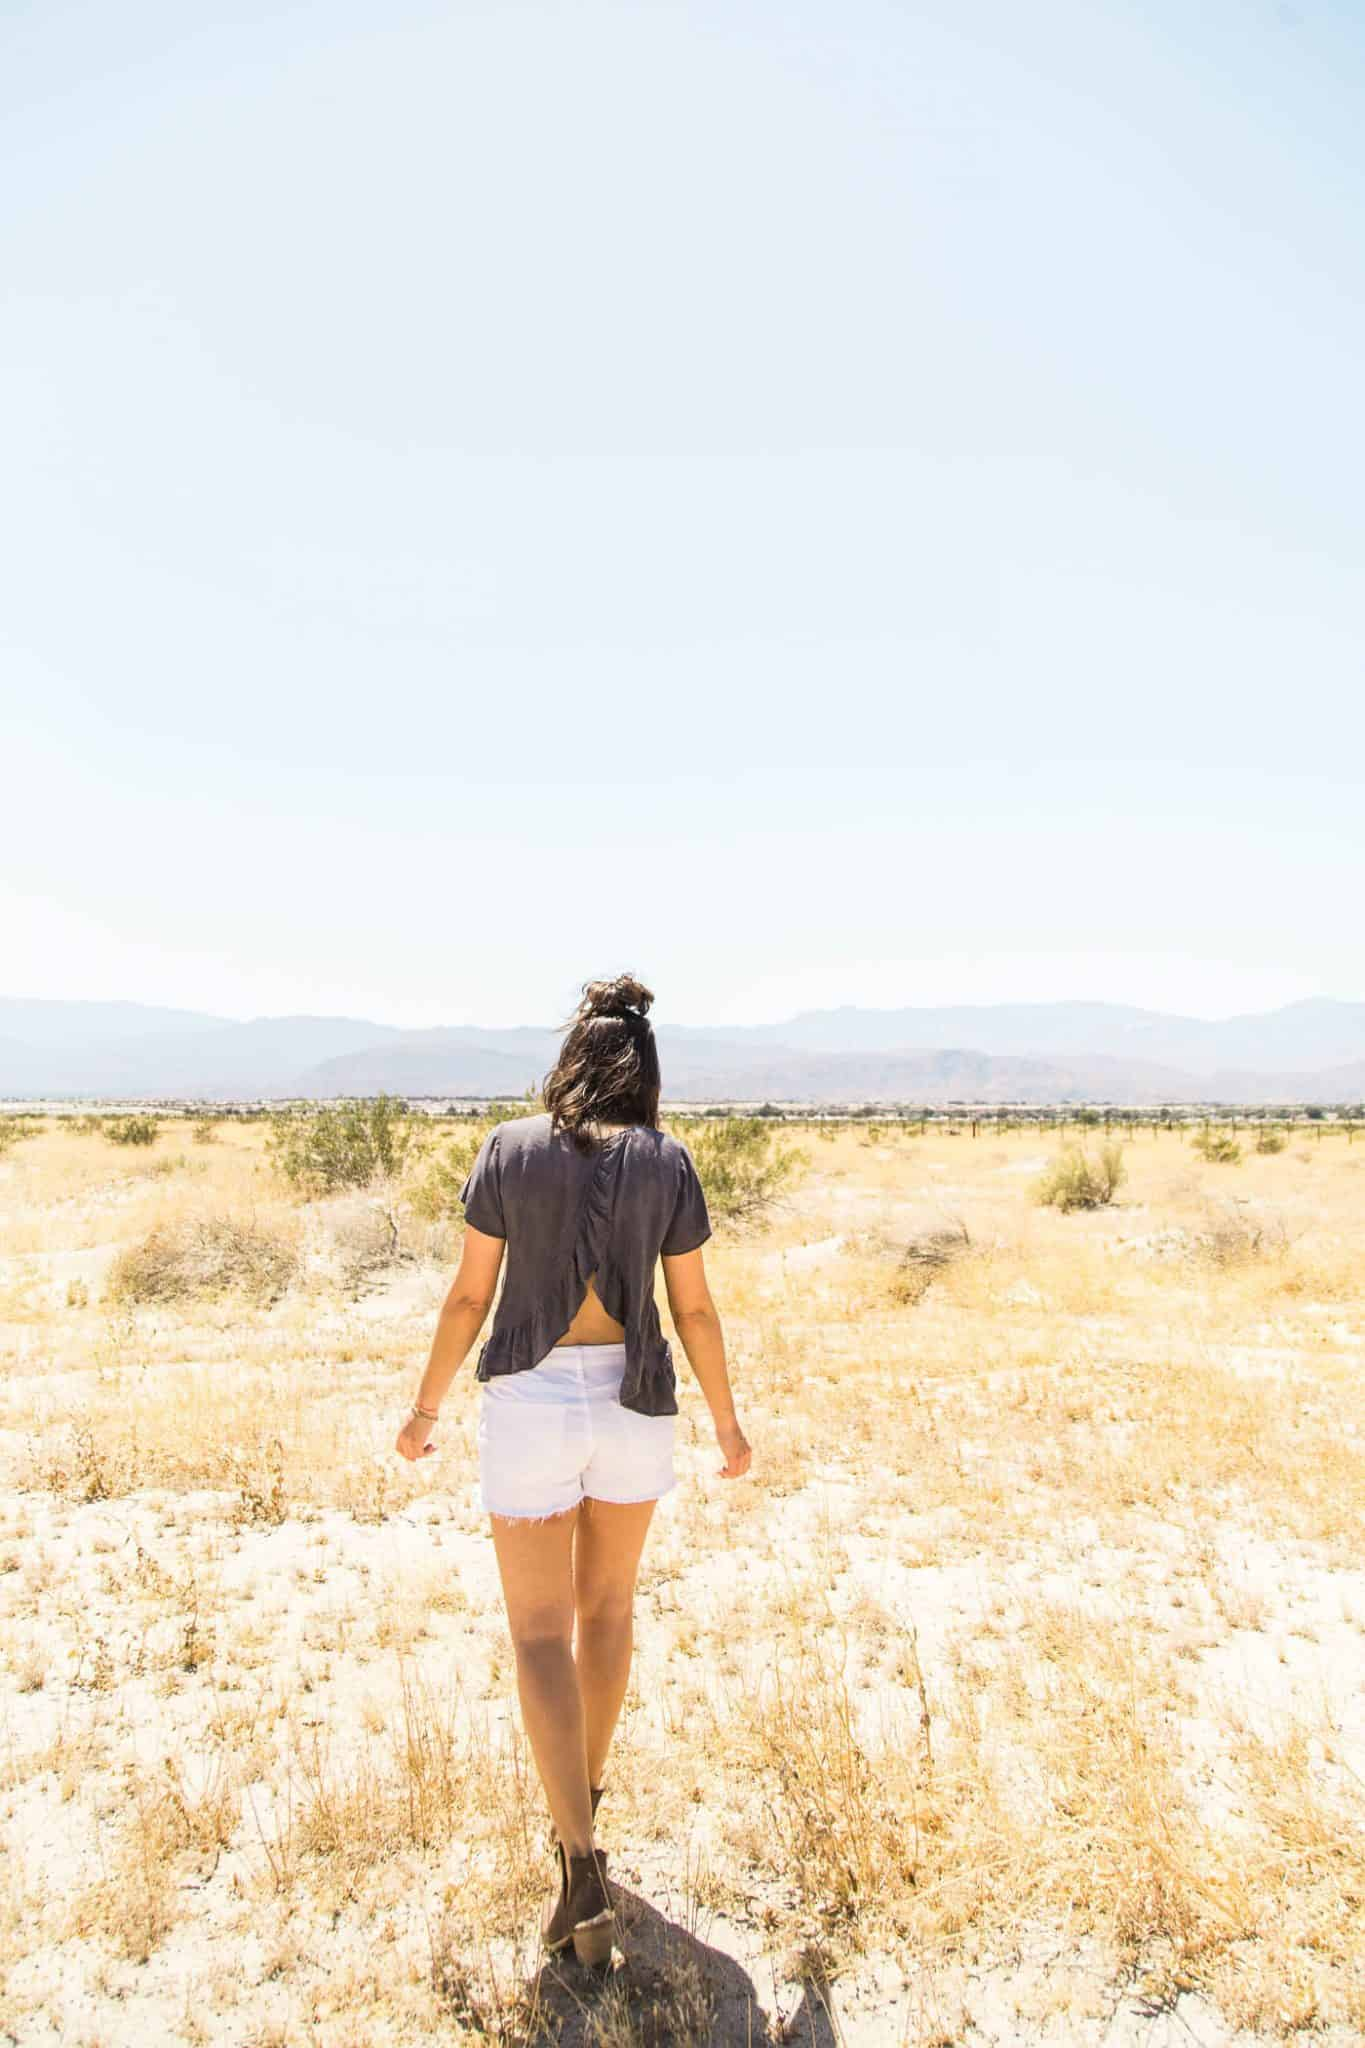 What to wear to a music festival - desert photoshoot - My Style Vita @mystylevita